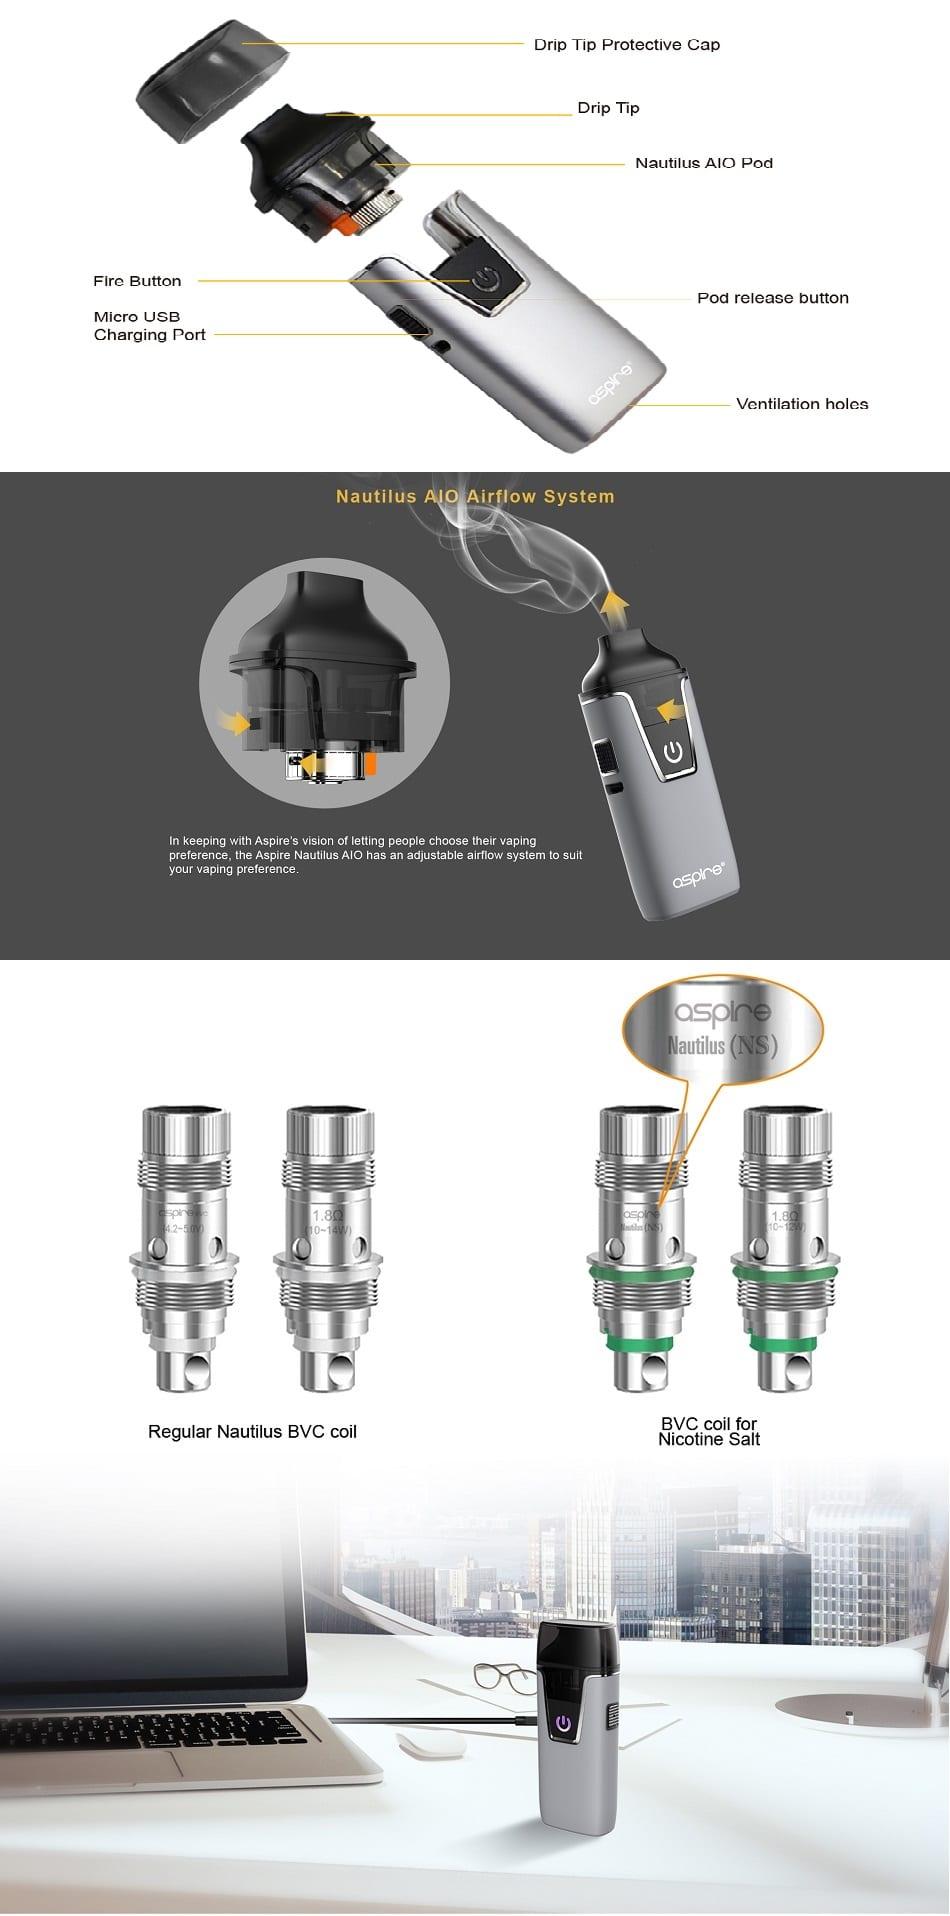 Aspire Nautilus AIO Starter Kit 1000mAh